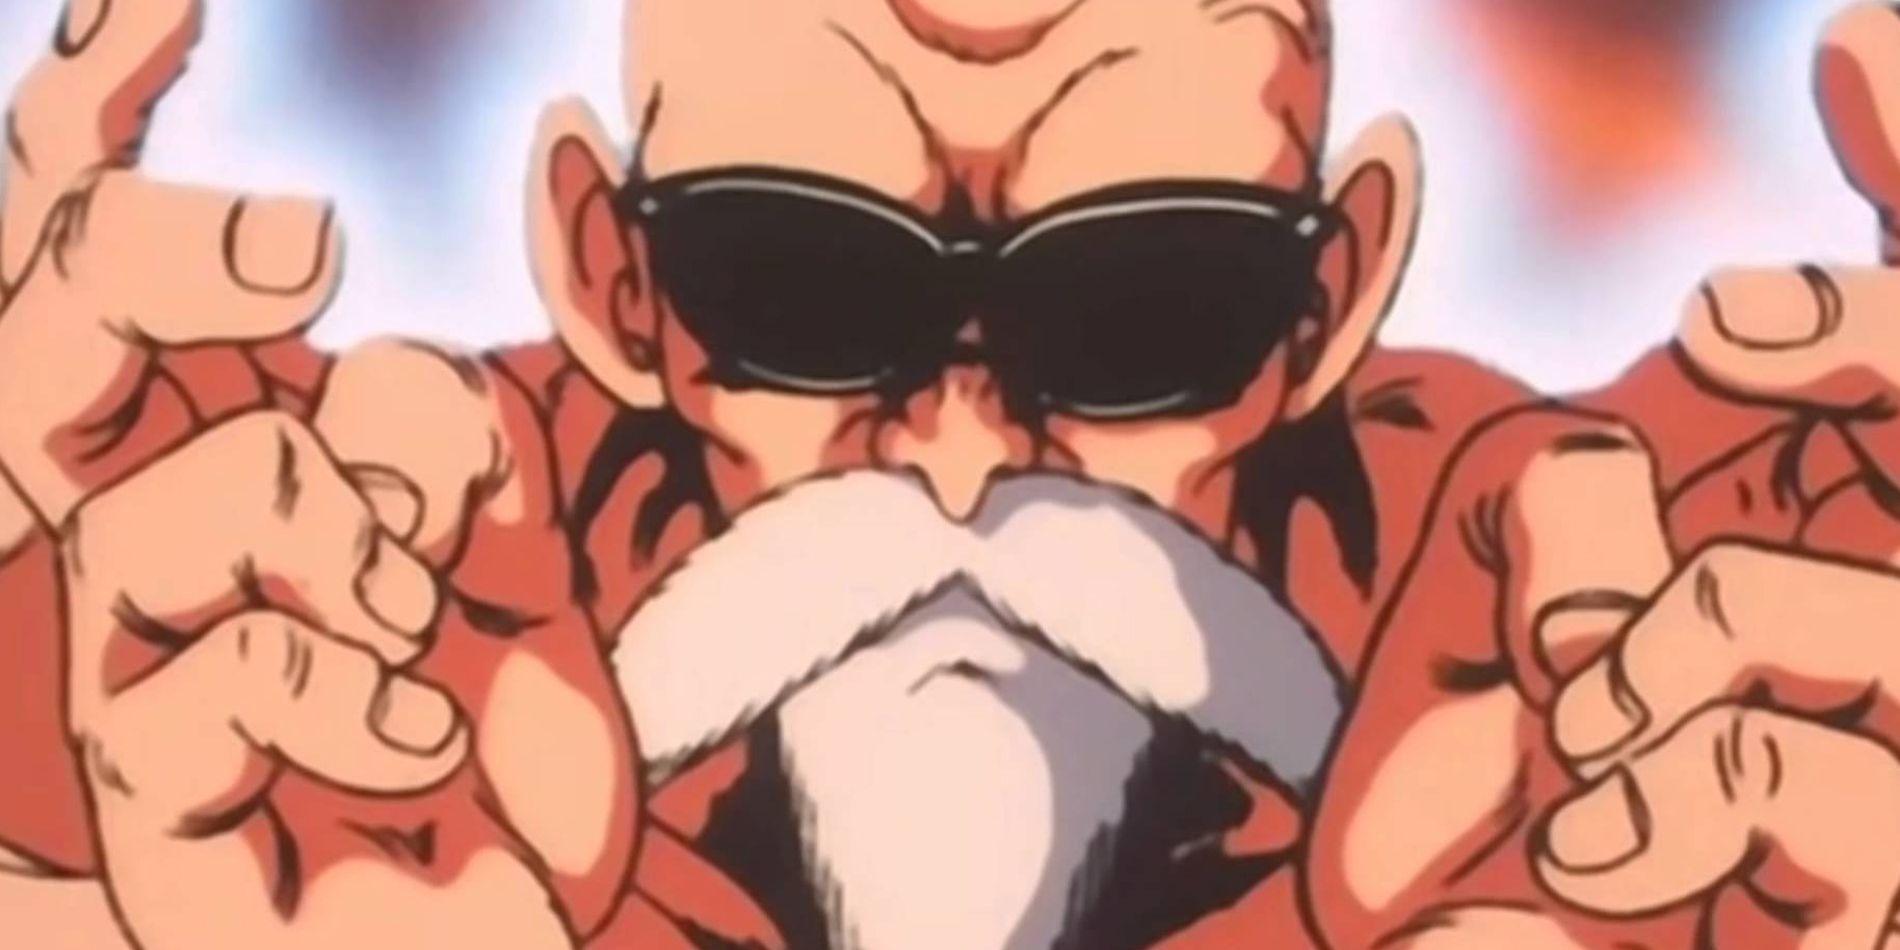 Adult anime master